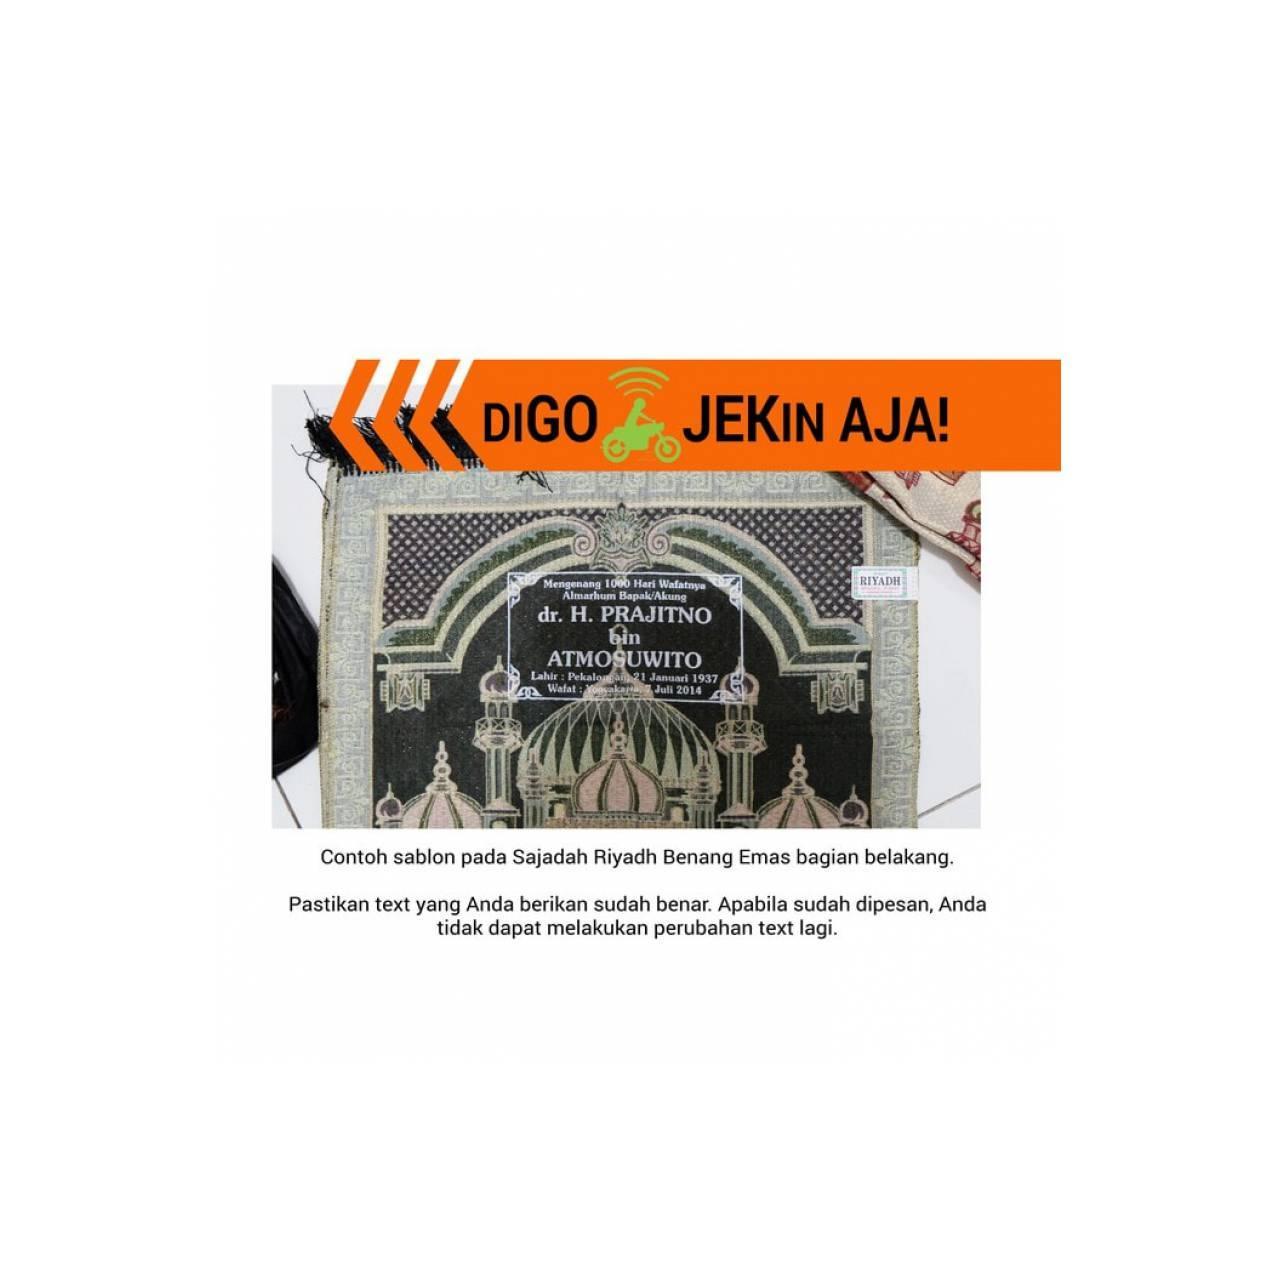 Sajadah Travel Riyadh Spec Dan Daftar Harga Terbaru Indonesia Okano Benang Emas 50x 100 Cm 10pcs Sablon Top Quality